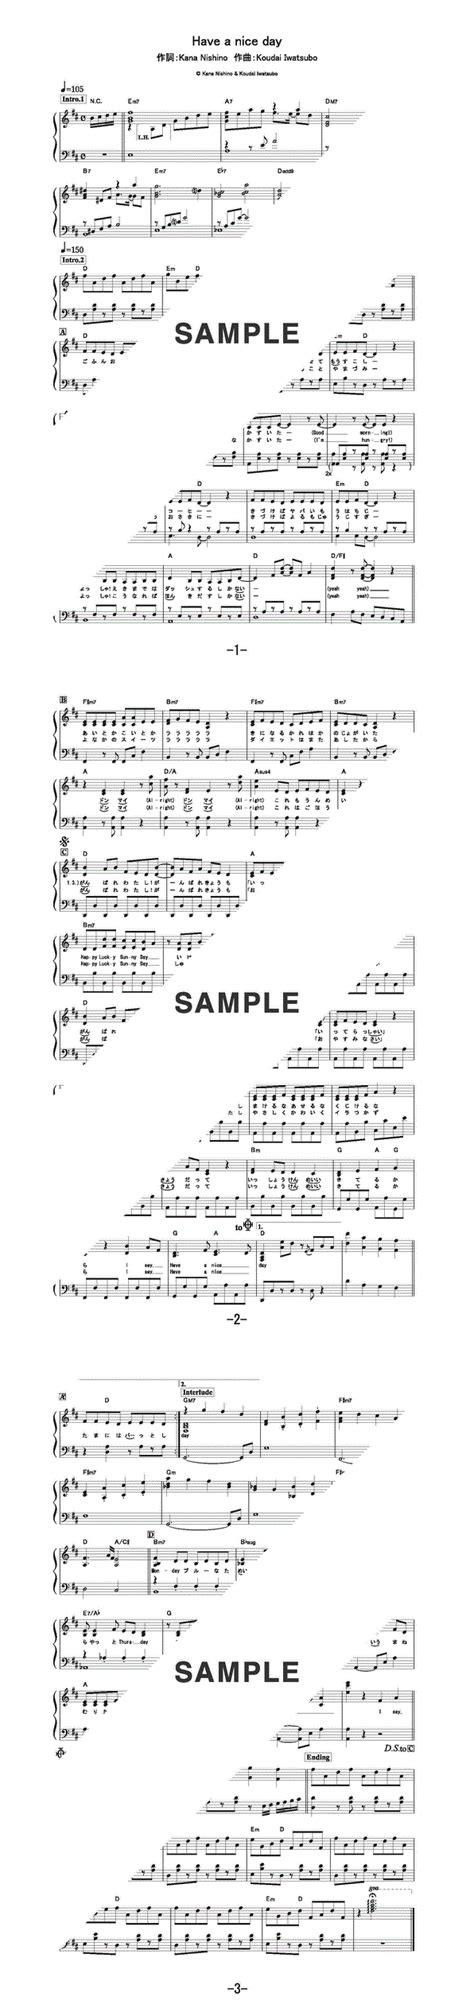 kana nishino day 7 mp3 have a nice day 西野 カナ のピアノ ソロ譜 中級 フェアリー elise